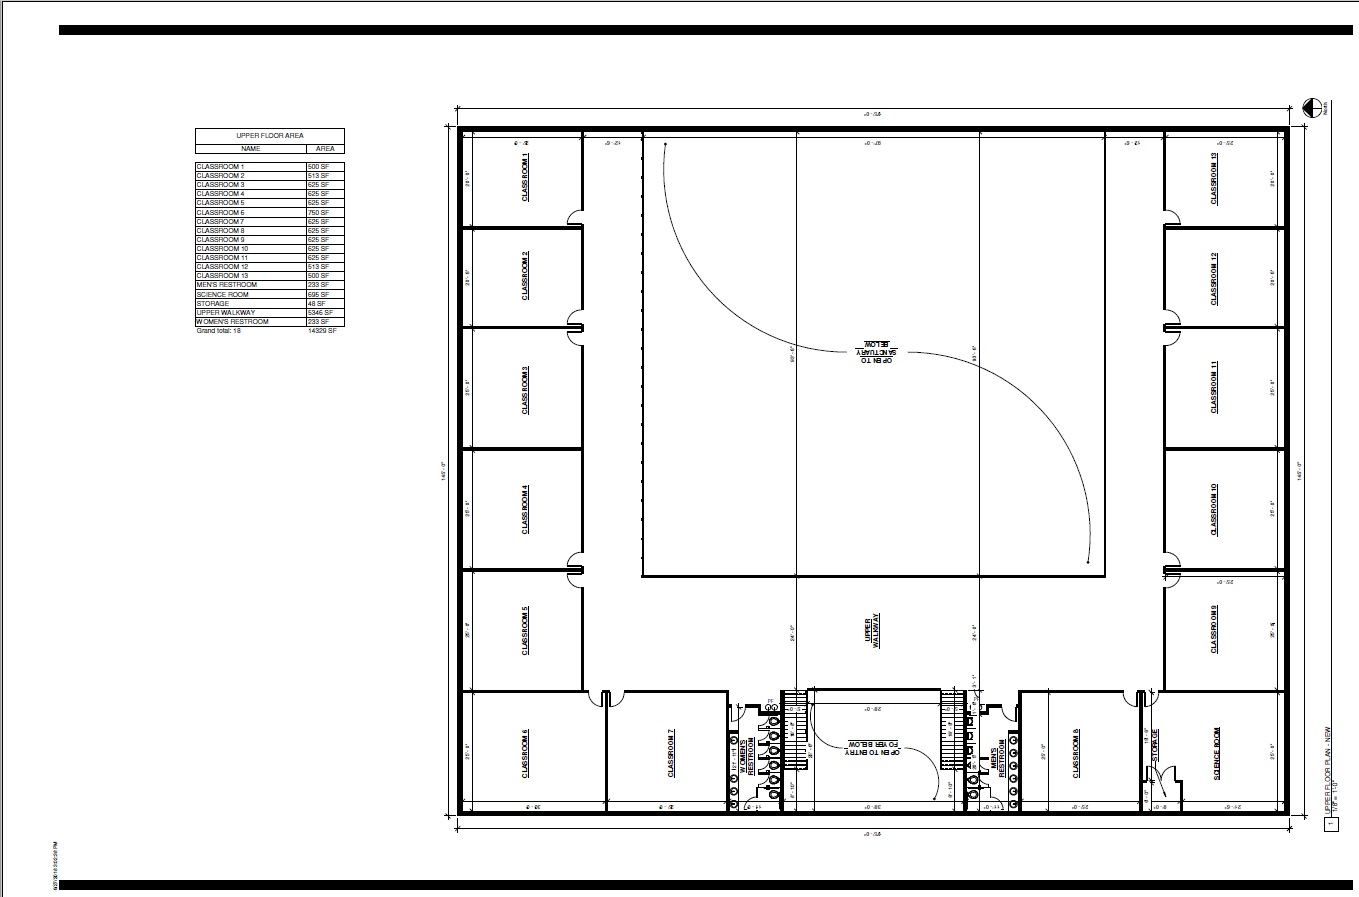 Second Floor Plan first draft